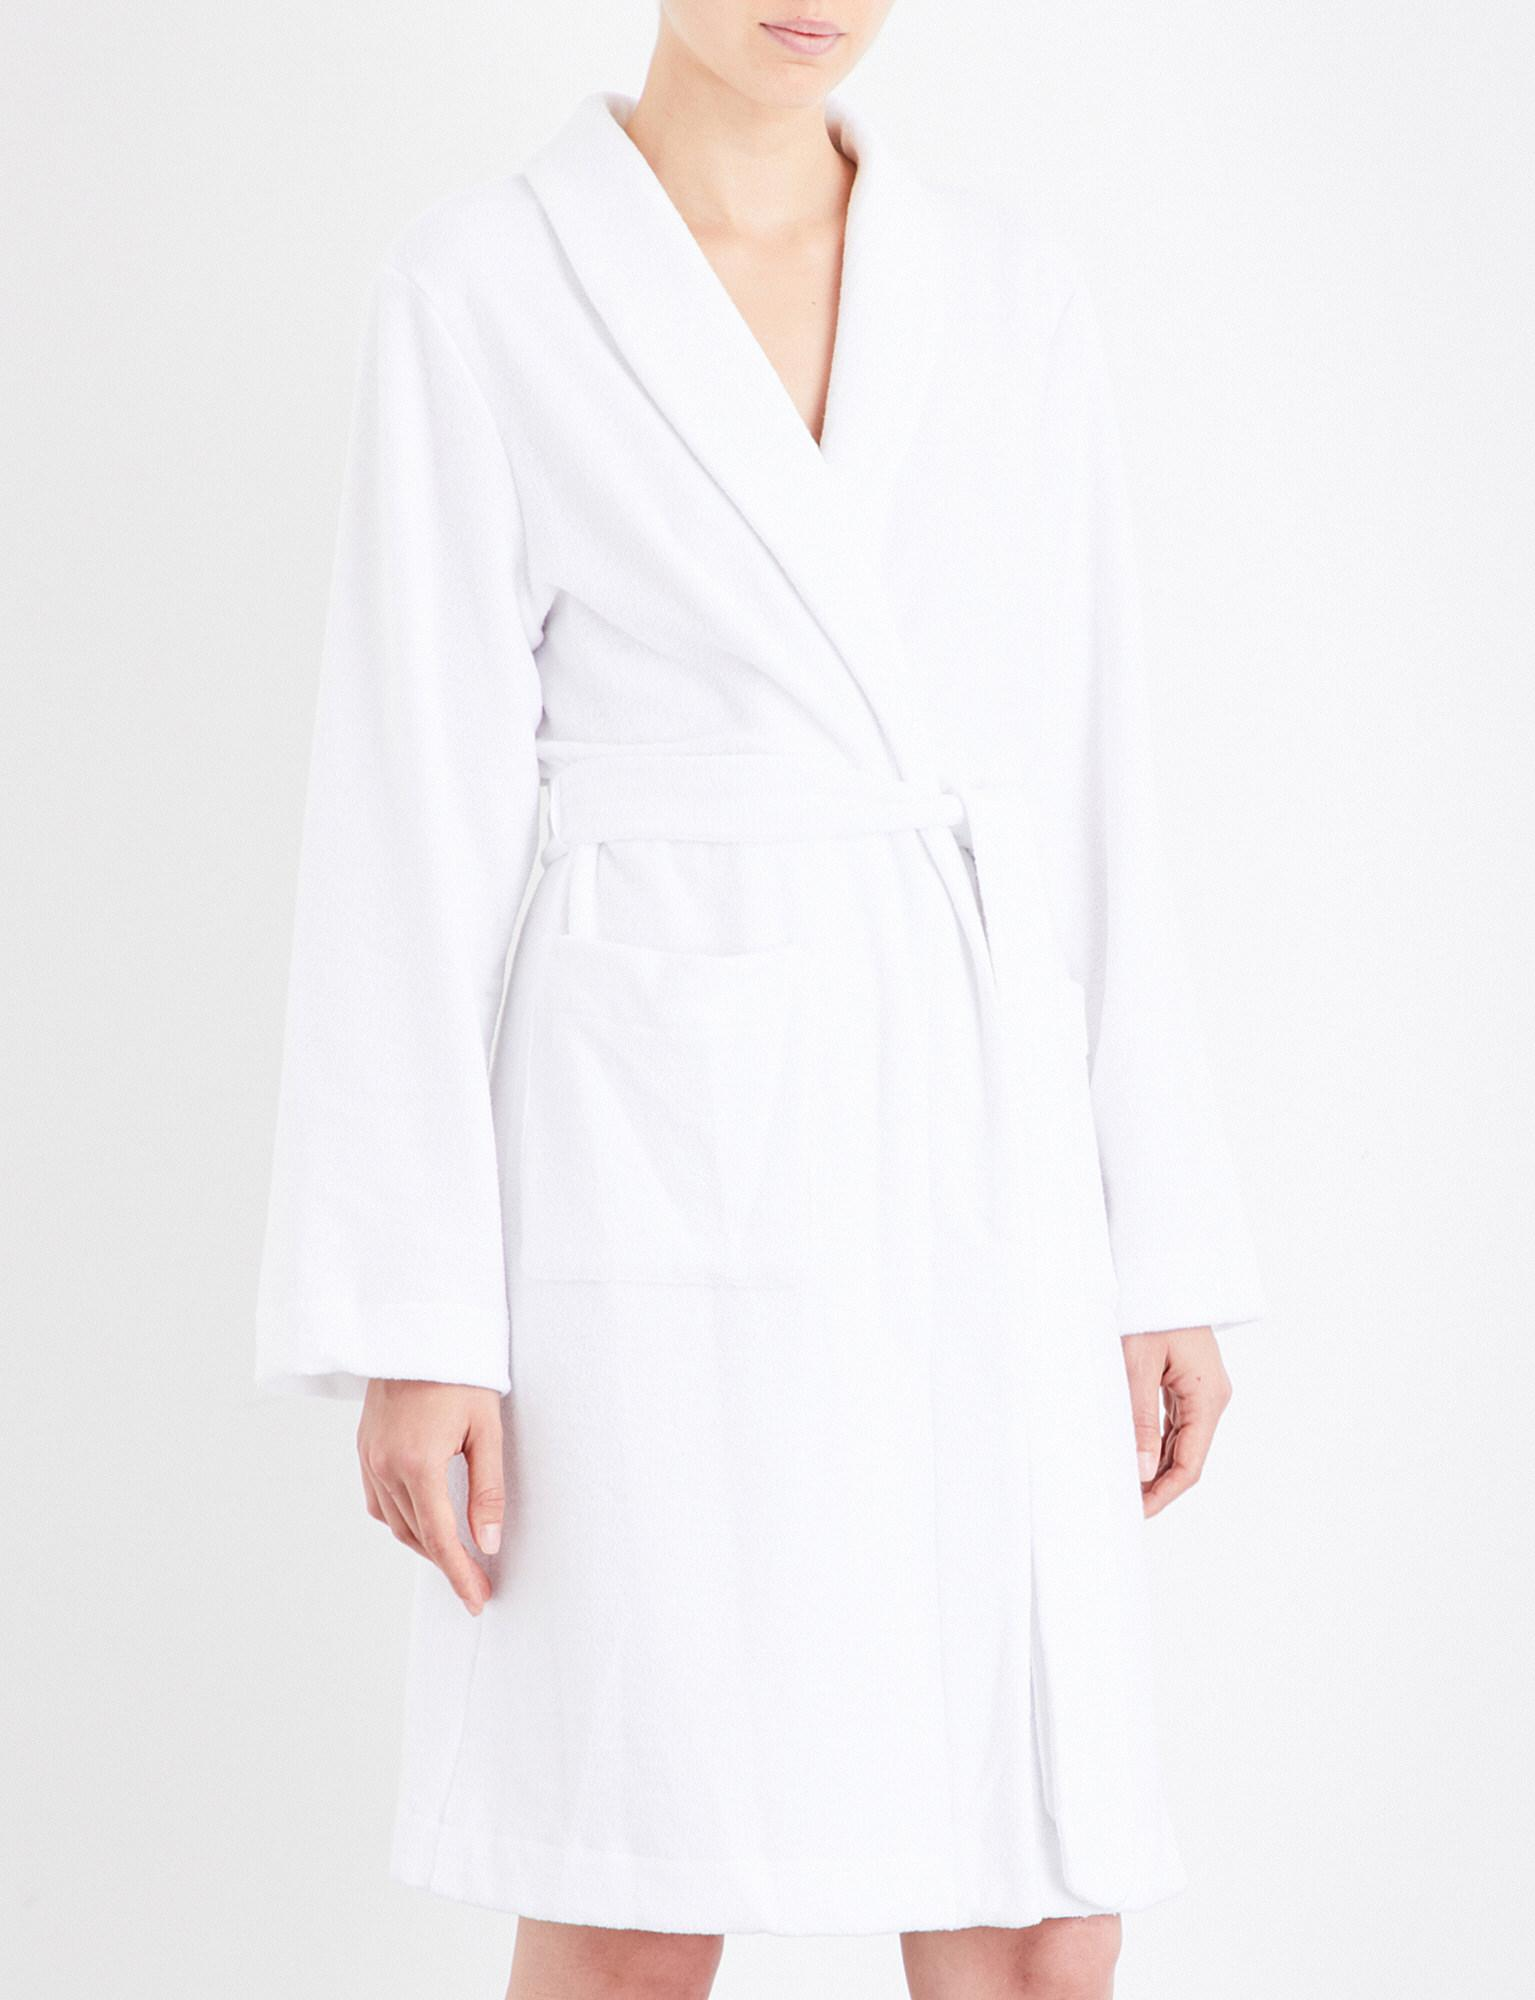 Lyst - Hanro Plush Towelling Robe in White